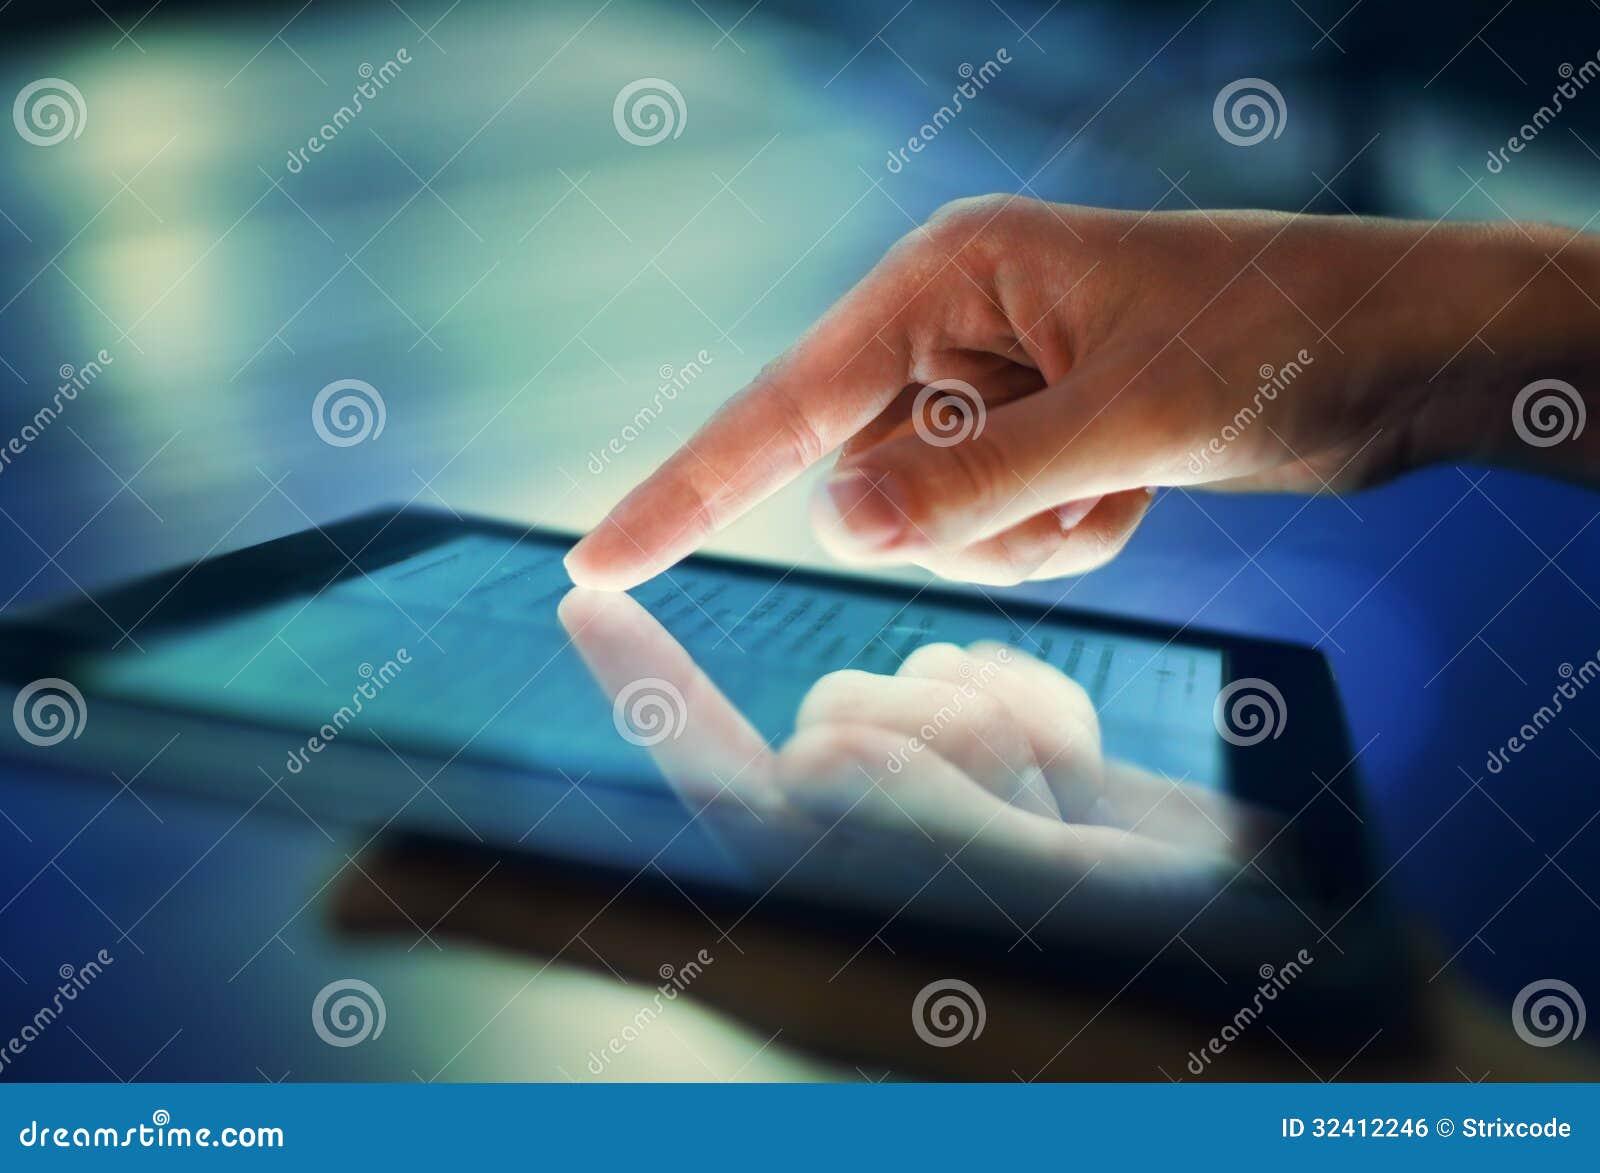 Hand pressing on screen digital tablet